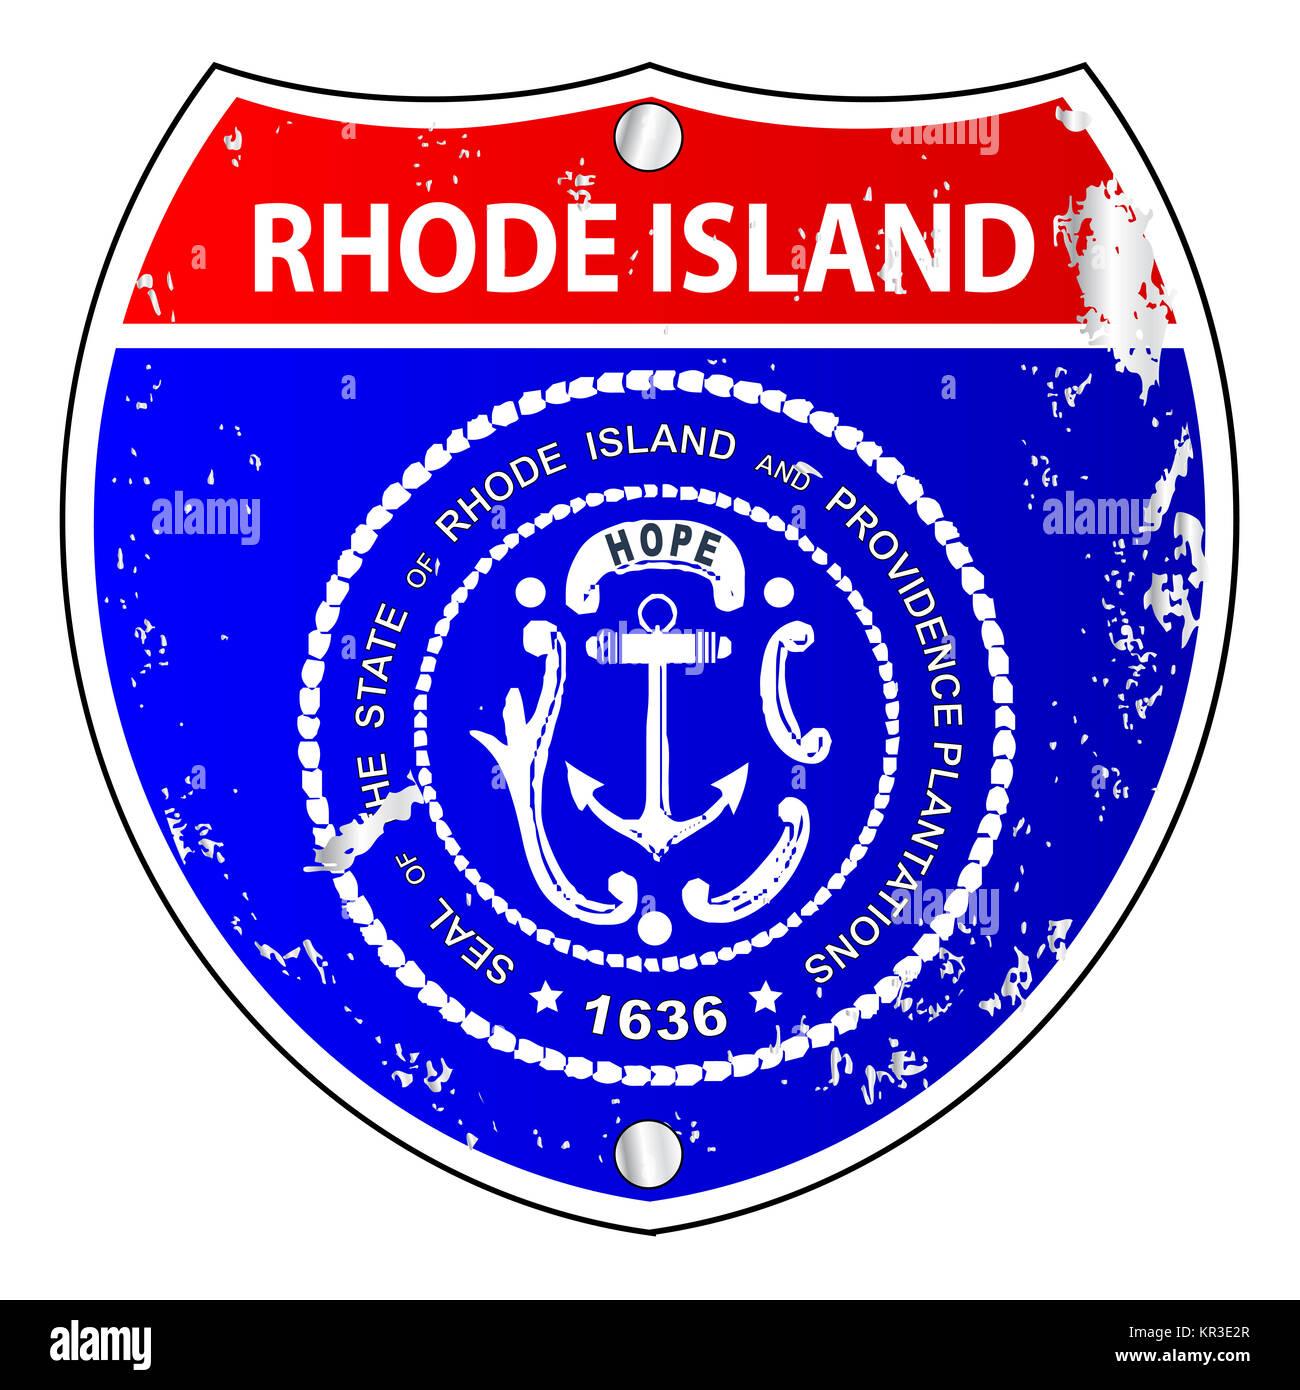 Rhode island flag stock photos rhode island flag stock images rhode island flag icons as interstate sign stock image biocorpaavc Choice Image